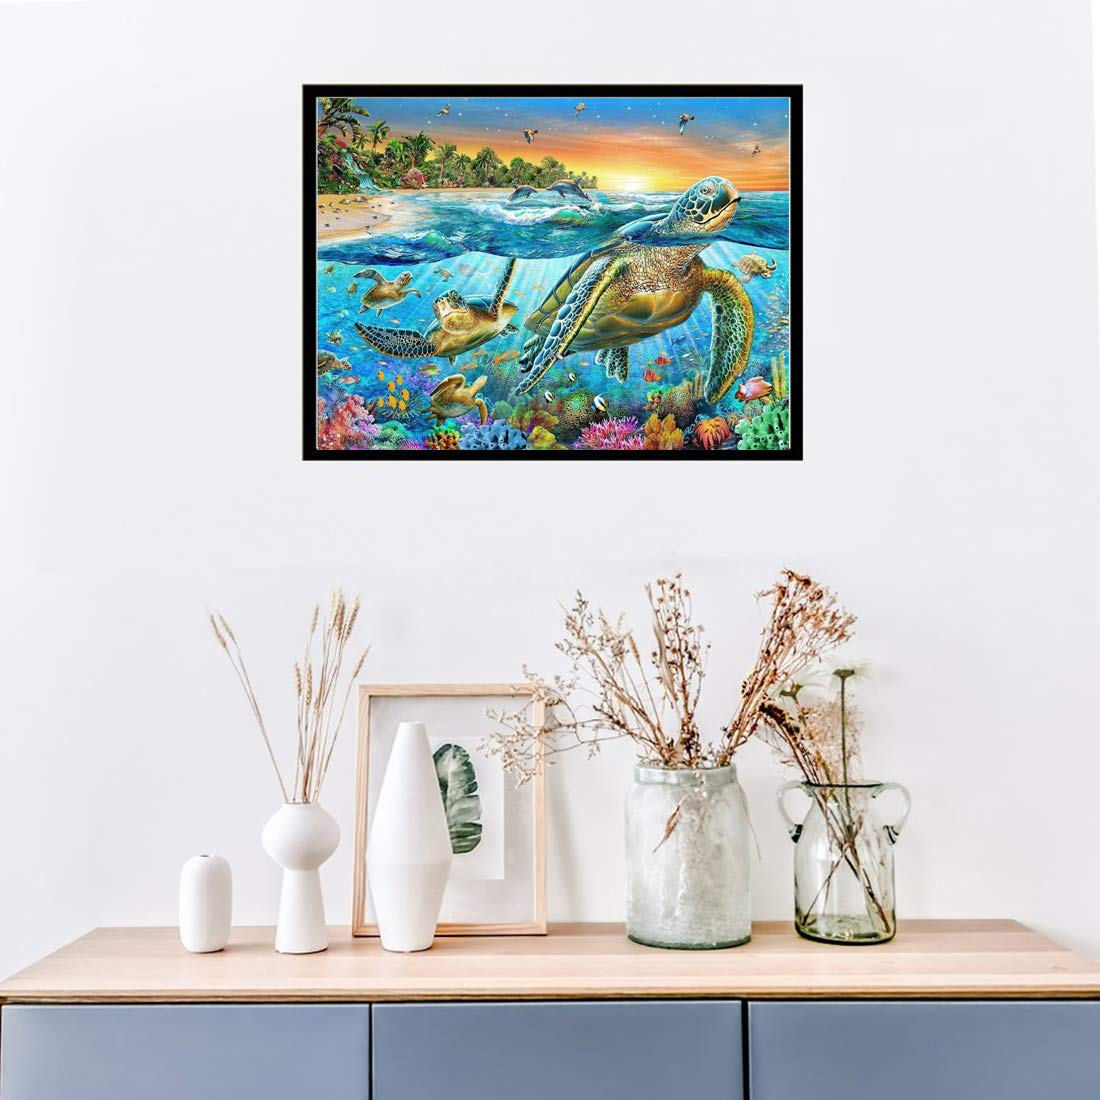 DIY 5D Diamond Painting Kit Full Diamond Dolphin Embroidery Rhinestone Cross Stitch Arts Craft Supply for Home Wall Decor